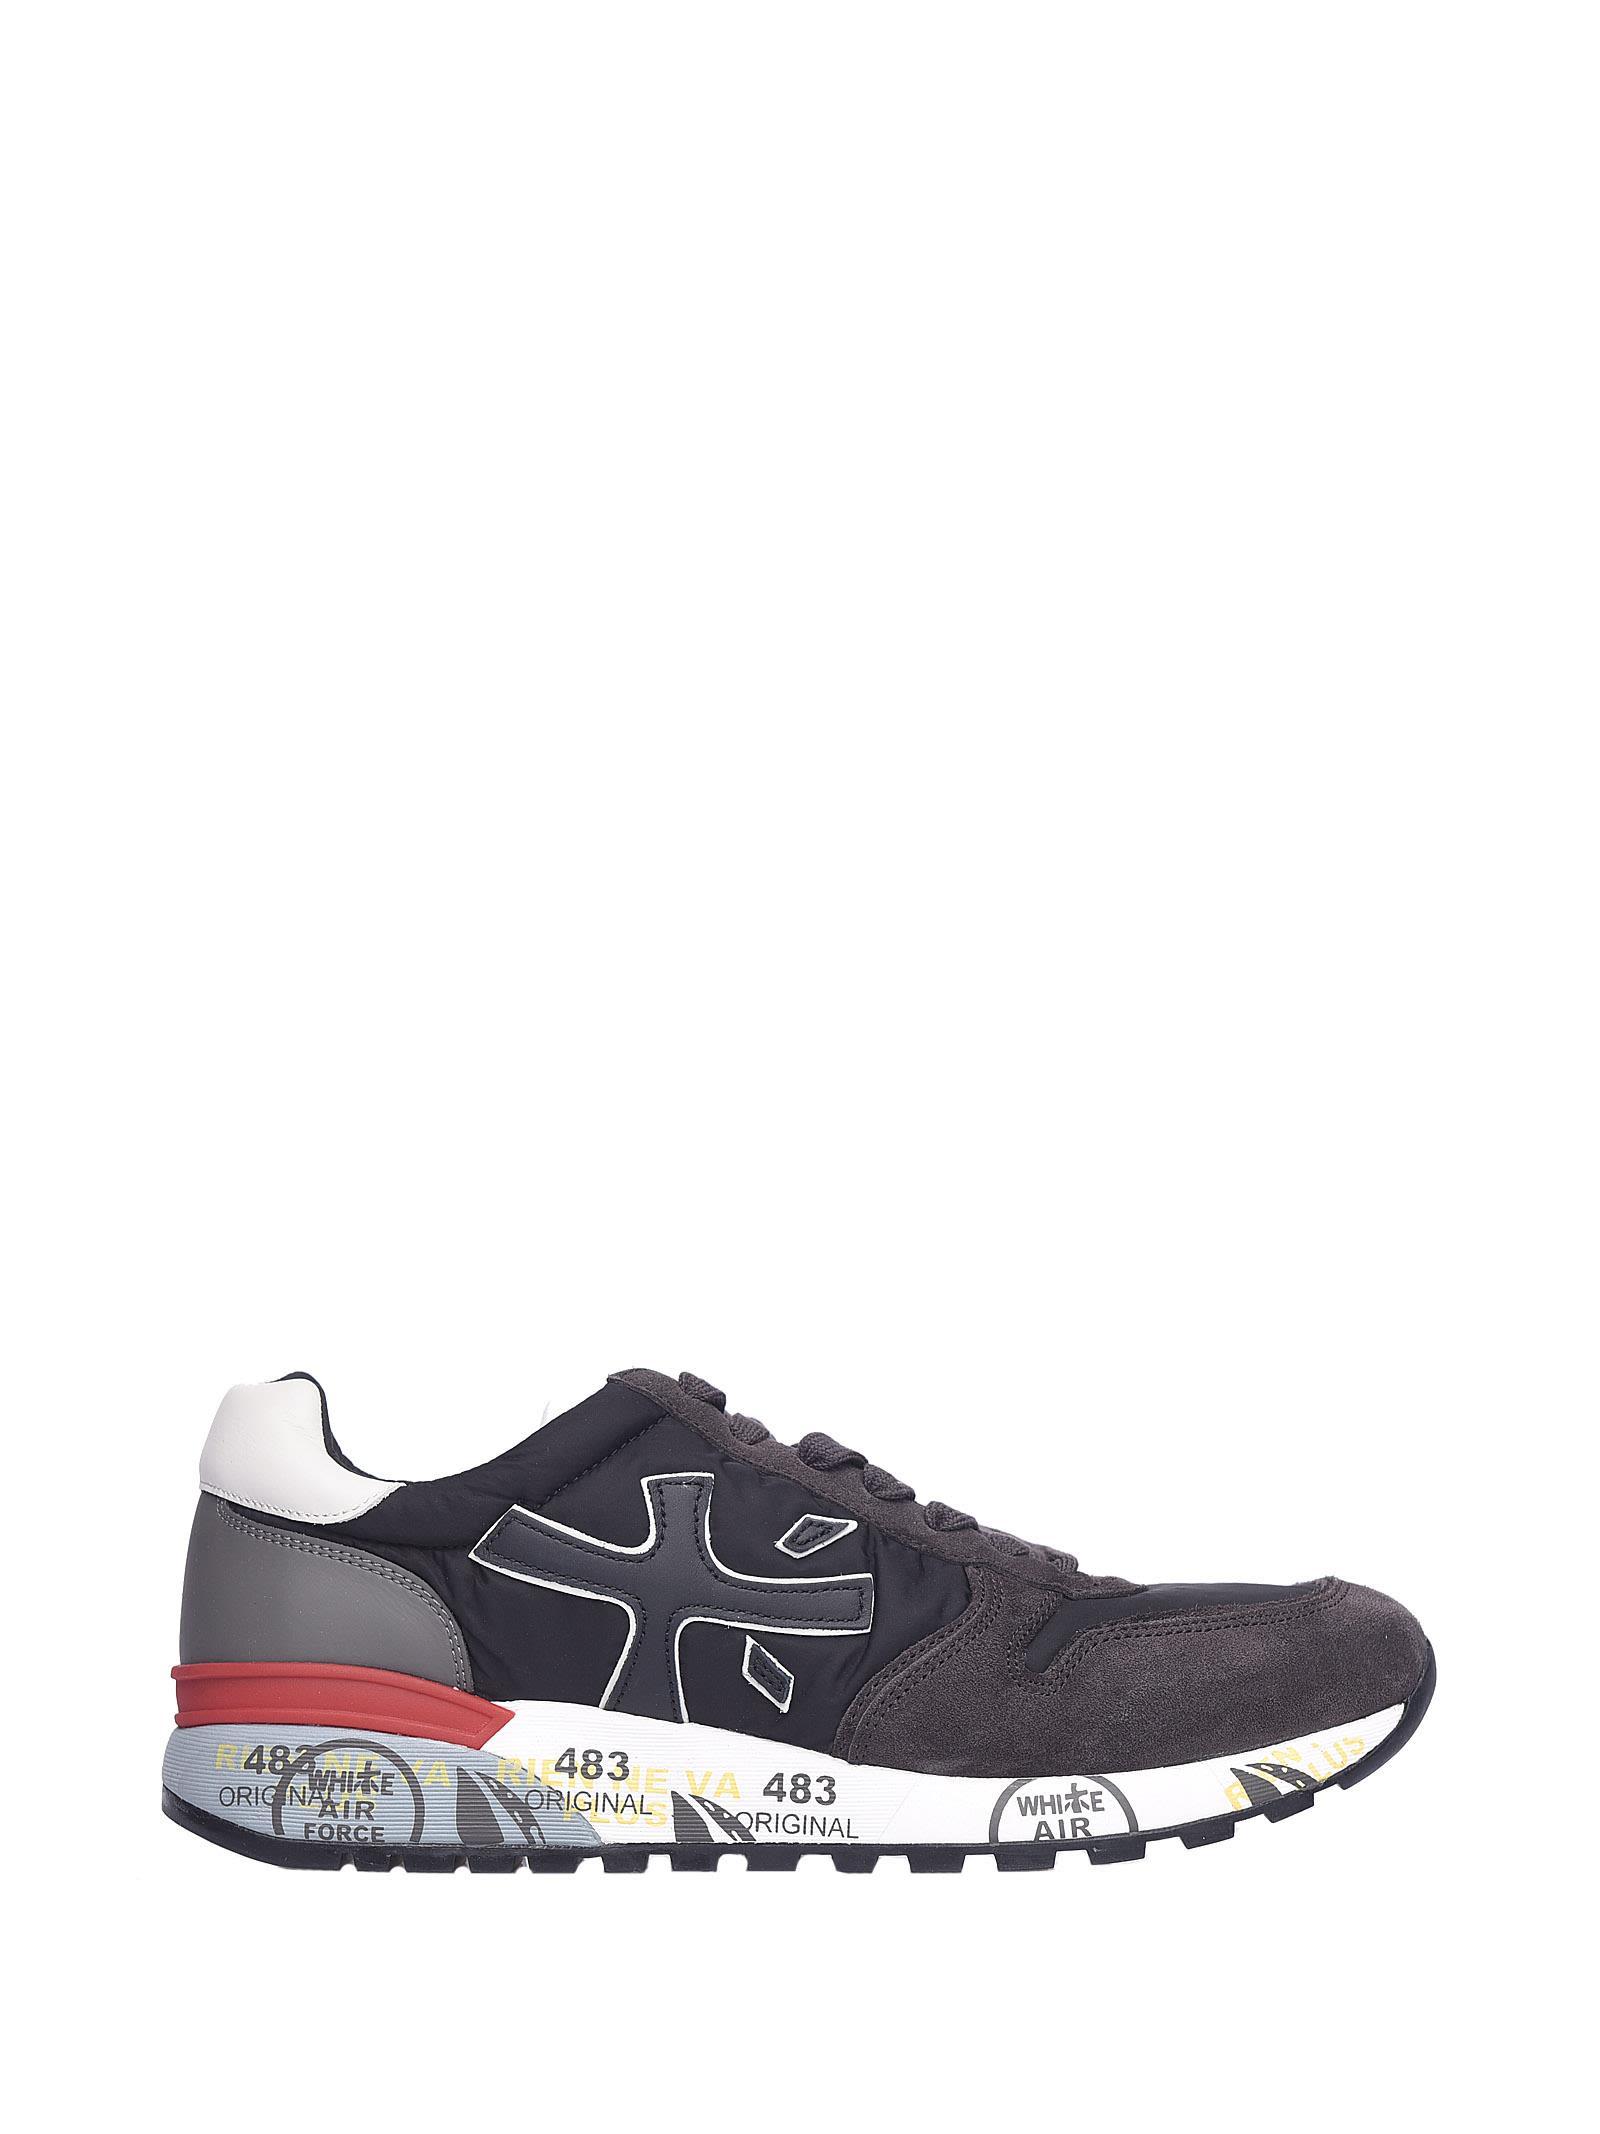 Premiata Mick 2343 Suede Sneakers